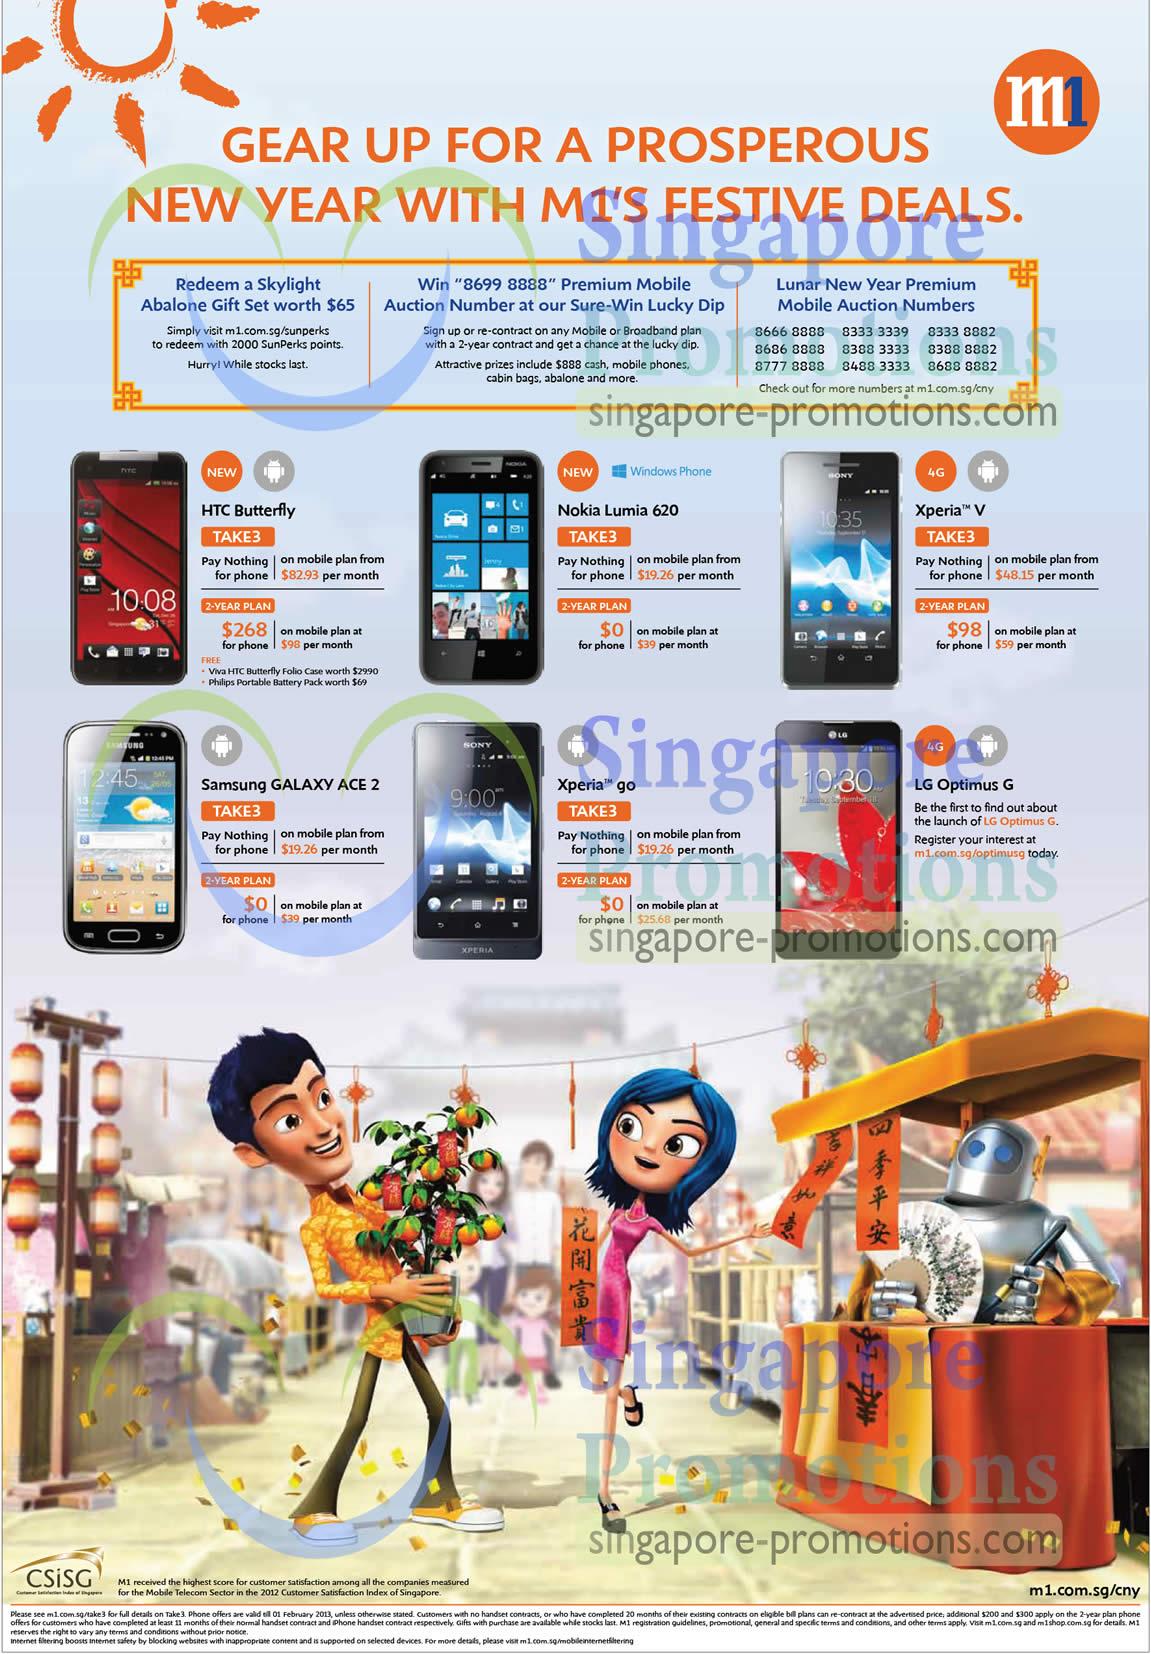 HTC Butterfly, Nokia Lumia 620, Sony Xperia V, Xperia Go, LG Optimus G, Samsung Galaxy Ace 2